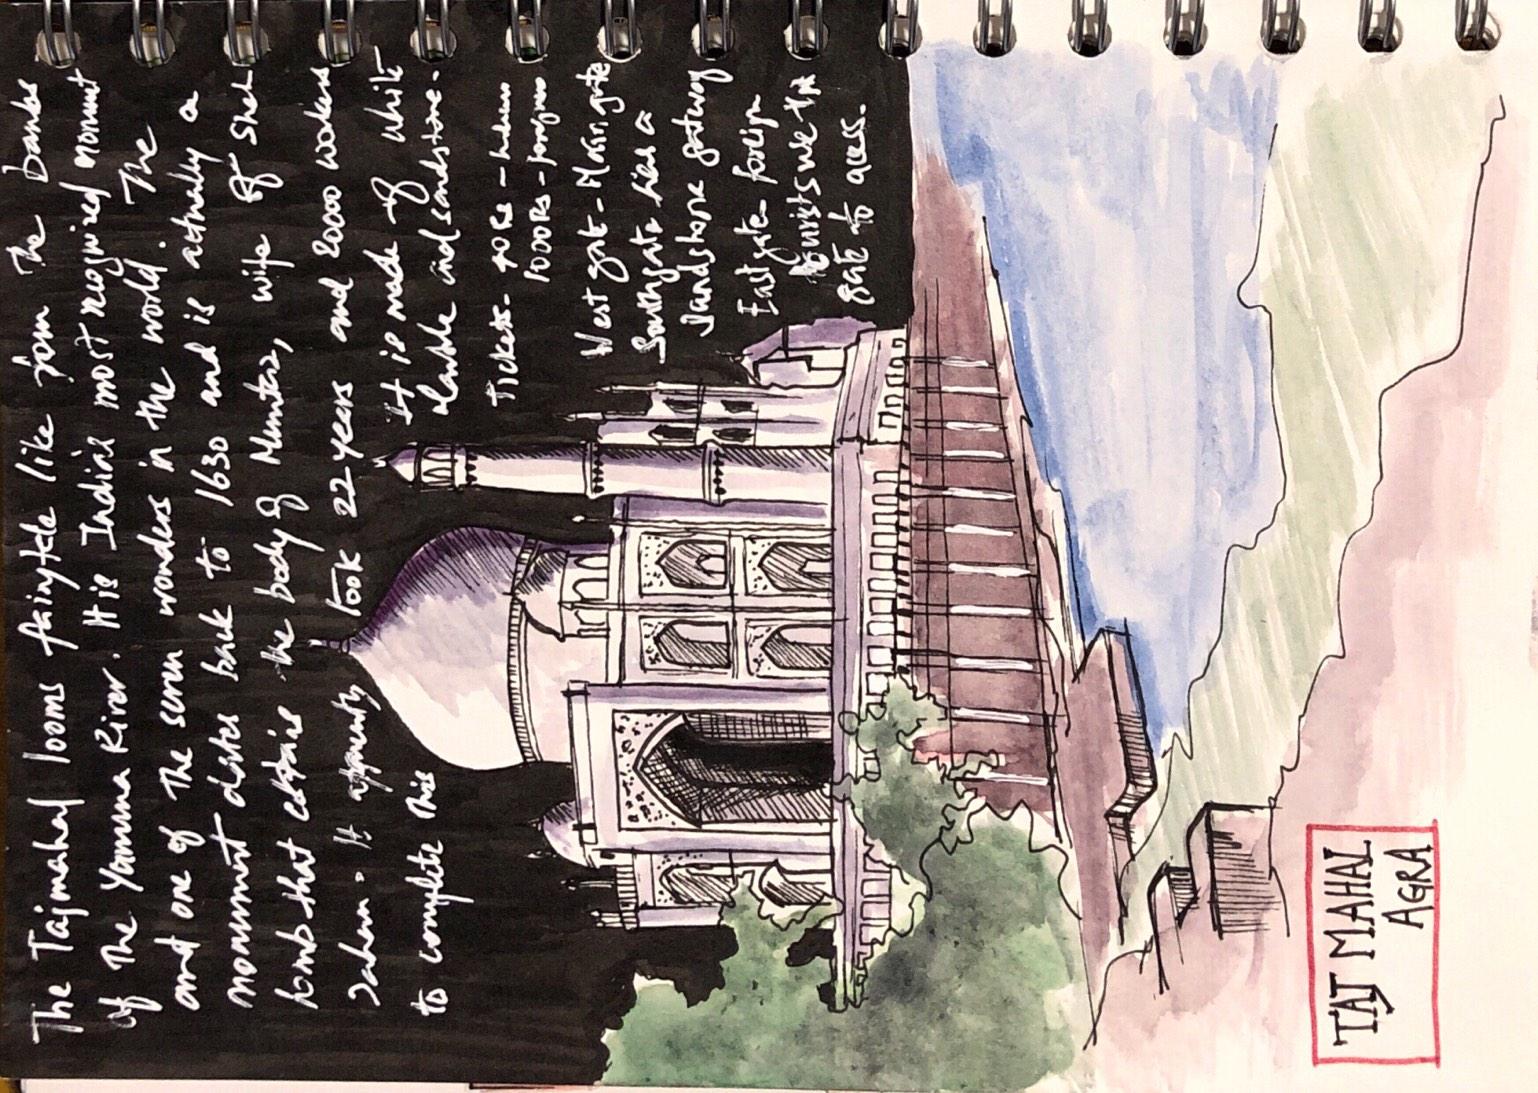 Taj-mahal-agra-sketch-sooraj